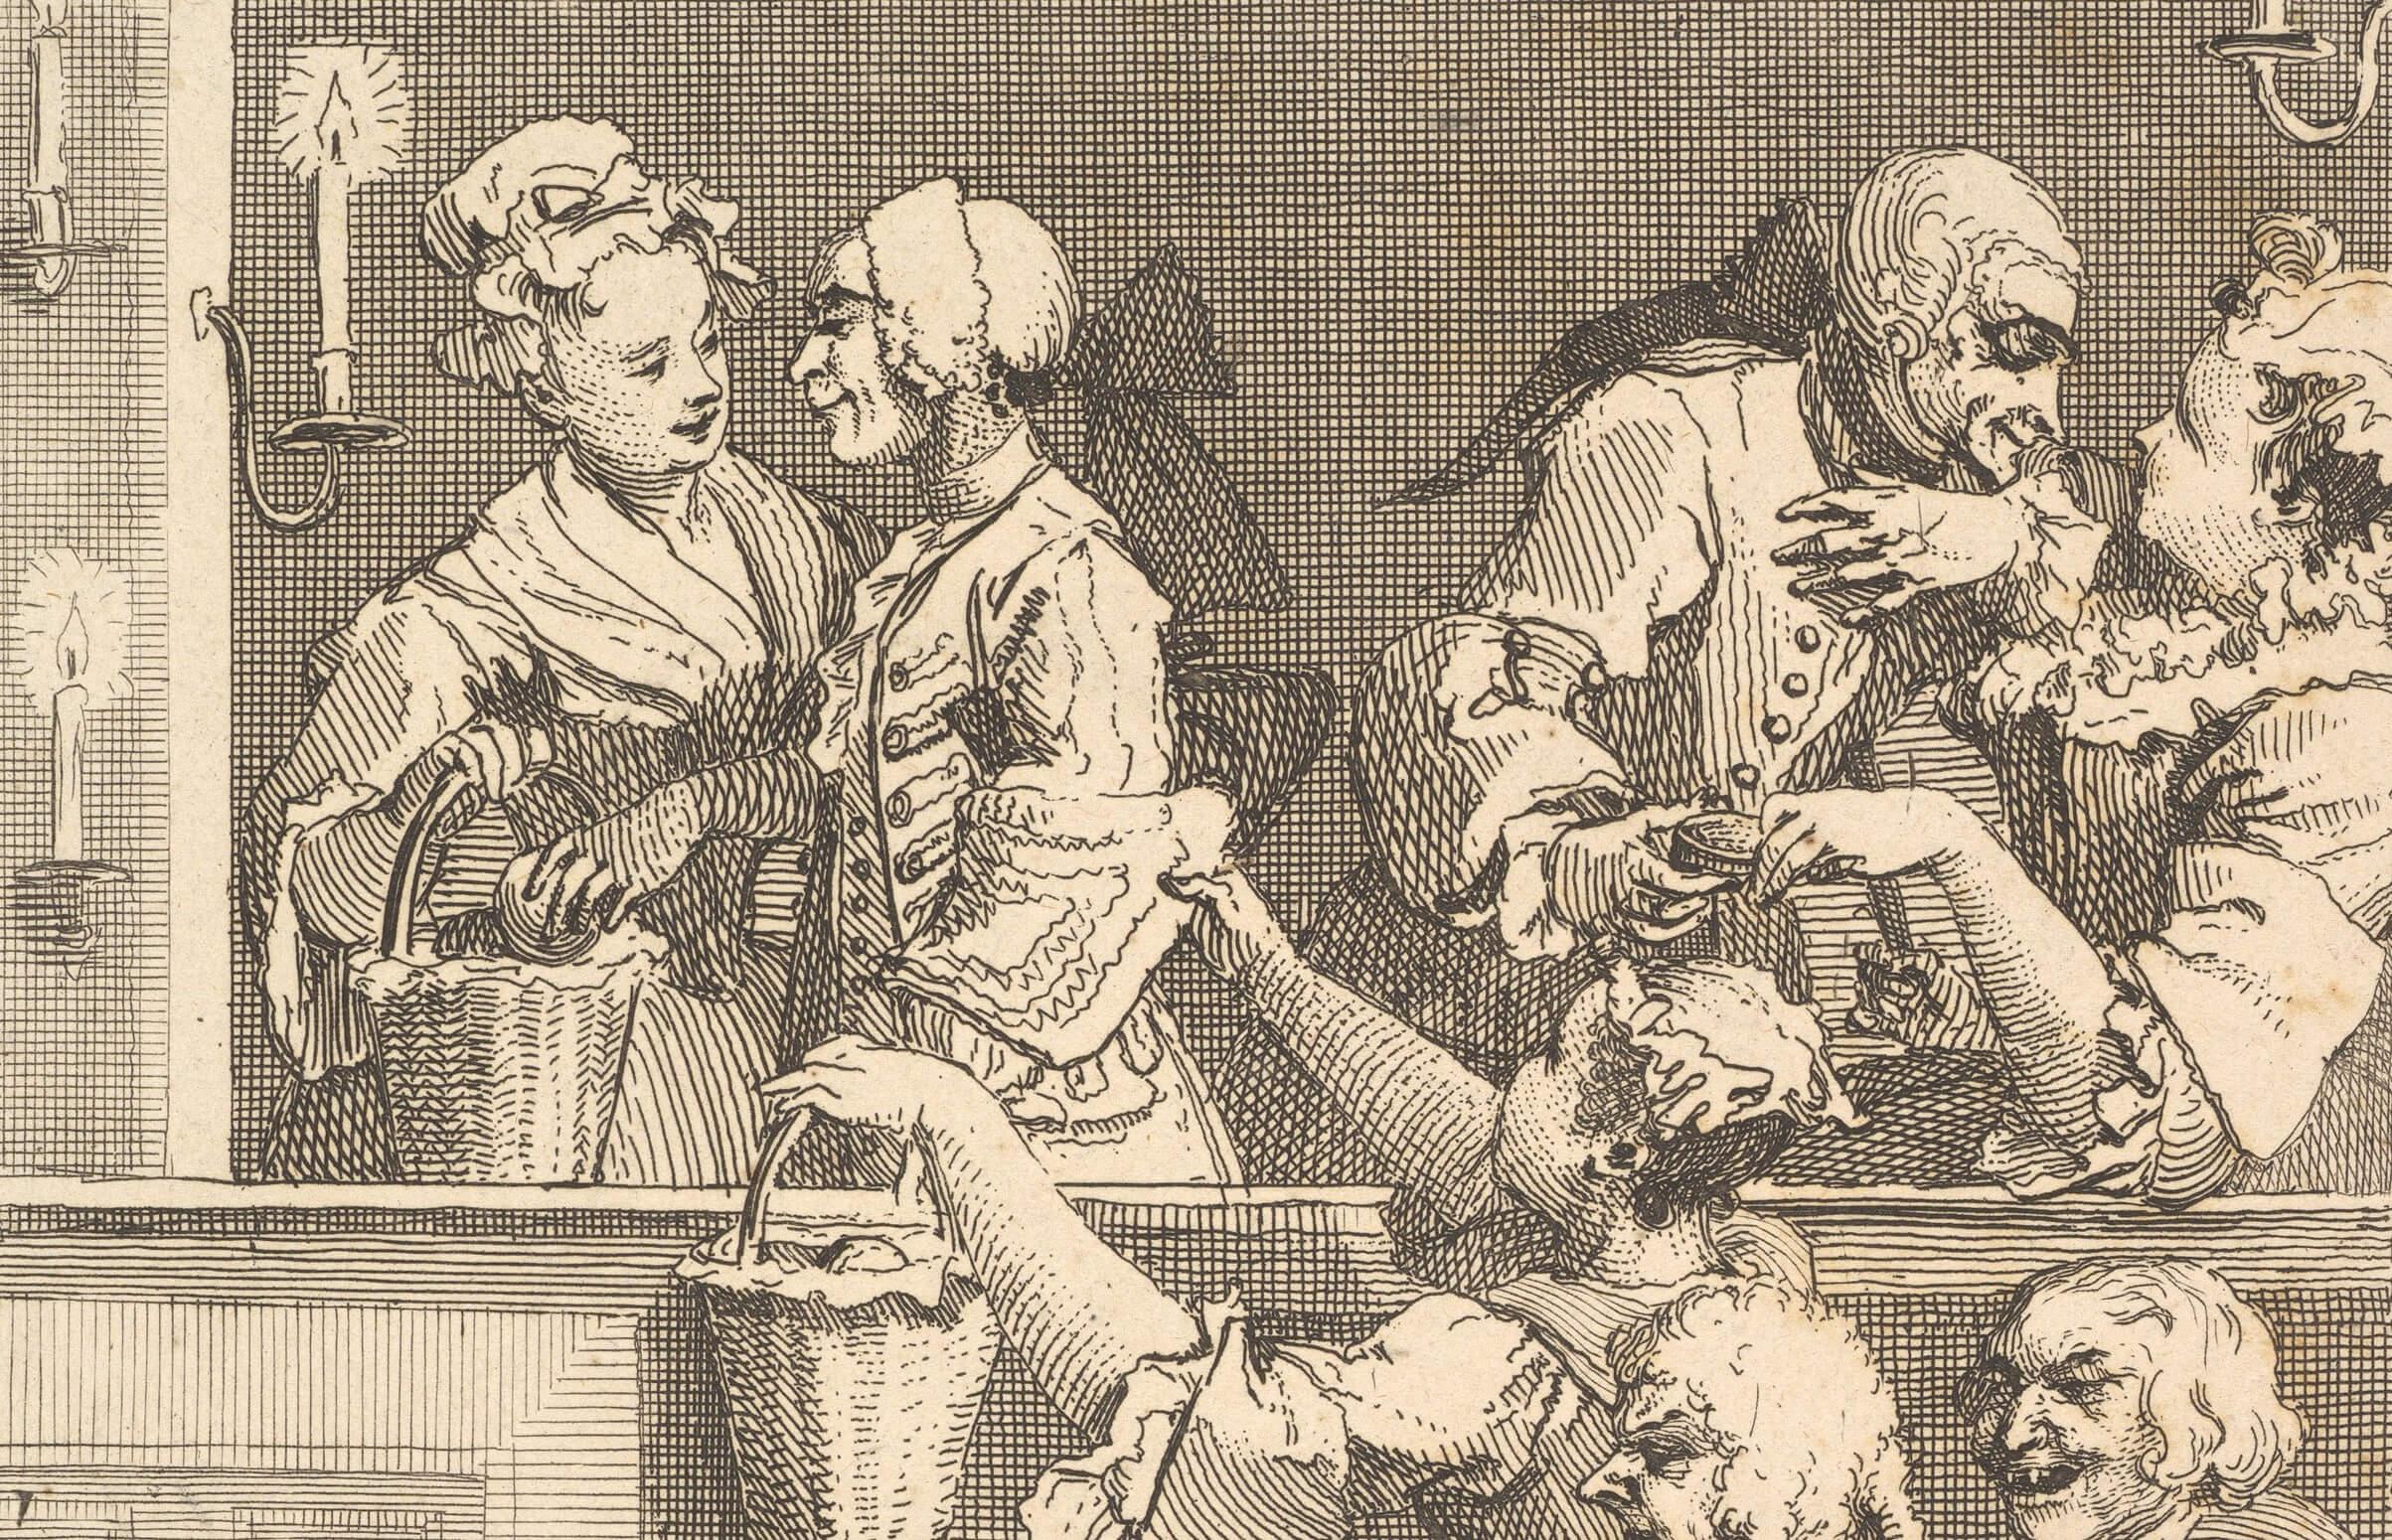 Conférence-Frédéric-Ogée-plaisir-sens-art-littèrature-XVIII